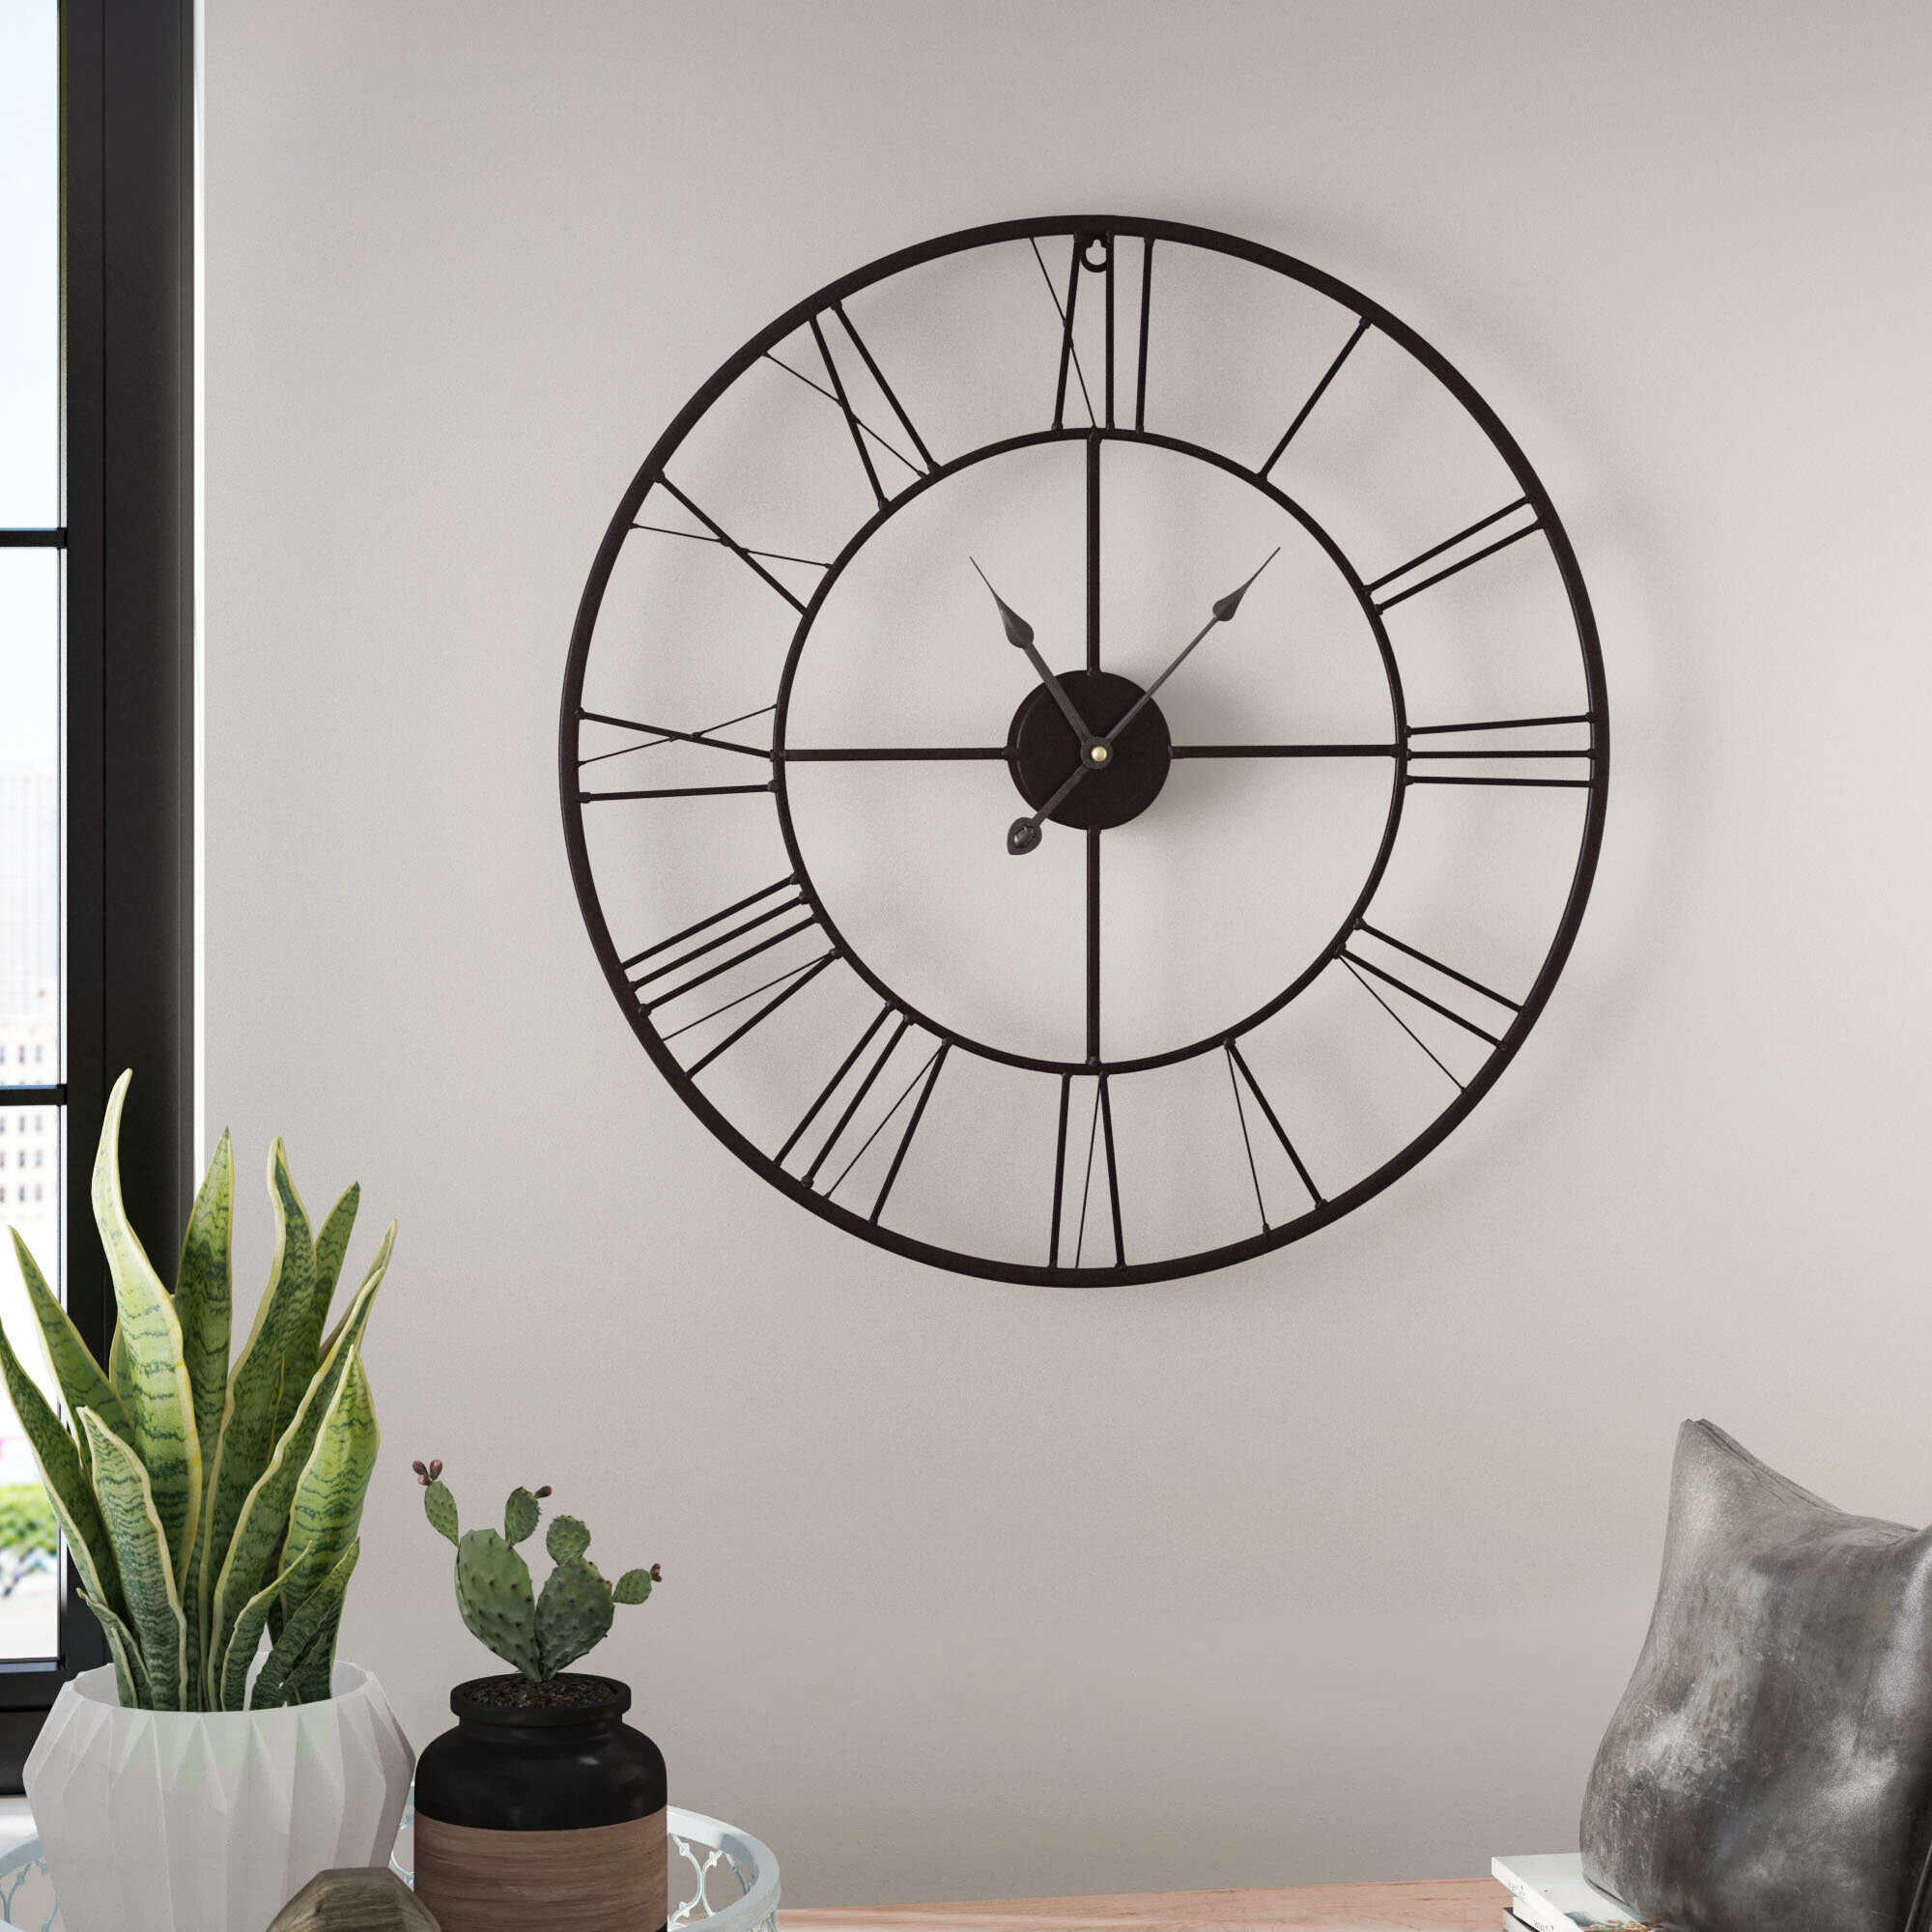 Farmhouse Wall Clocks Free Shipping Over 35 Wayfair